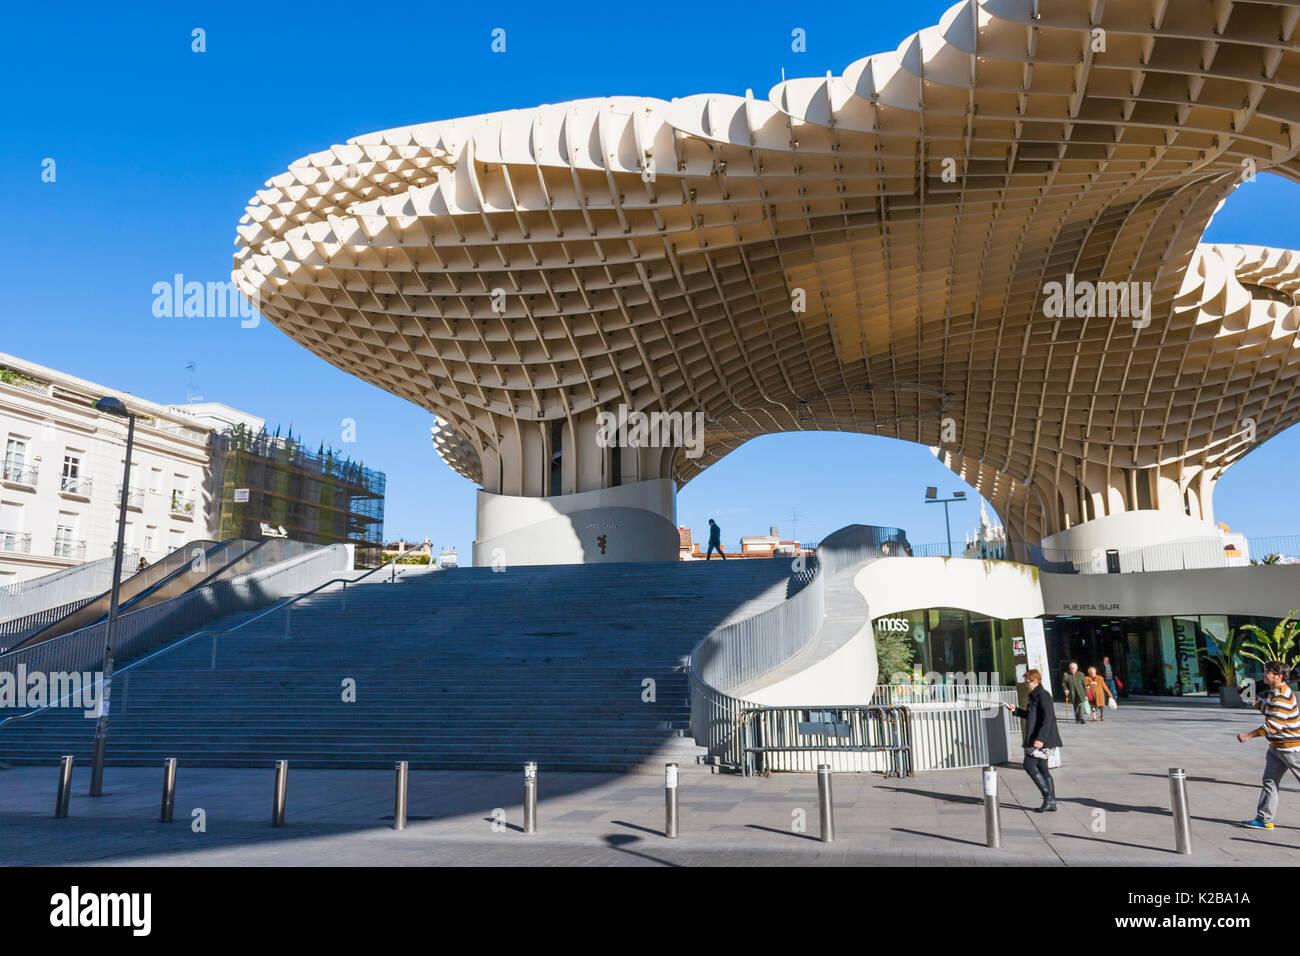 The Metropol Parasol, La Encarnación square, Seville, Spain. A wooden structure designed by German architect Jürgen Mayer, the building is popularly k - Stock Image